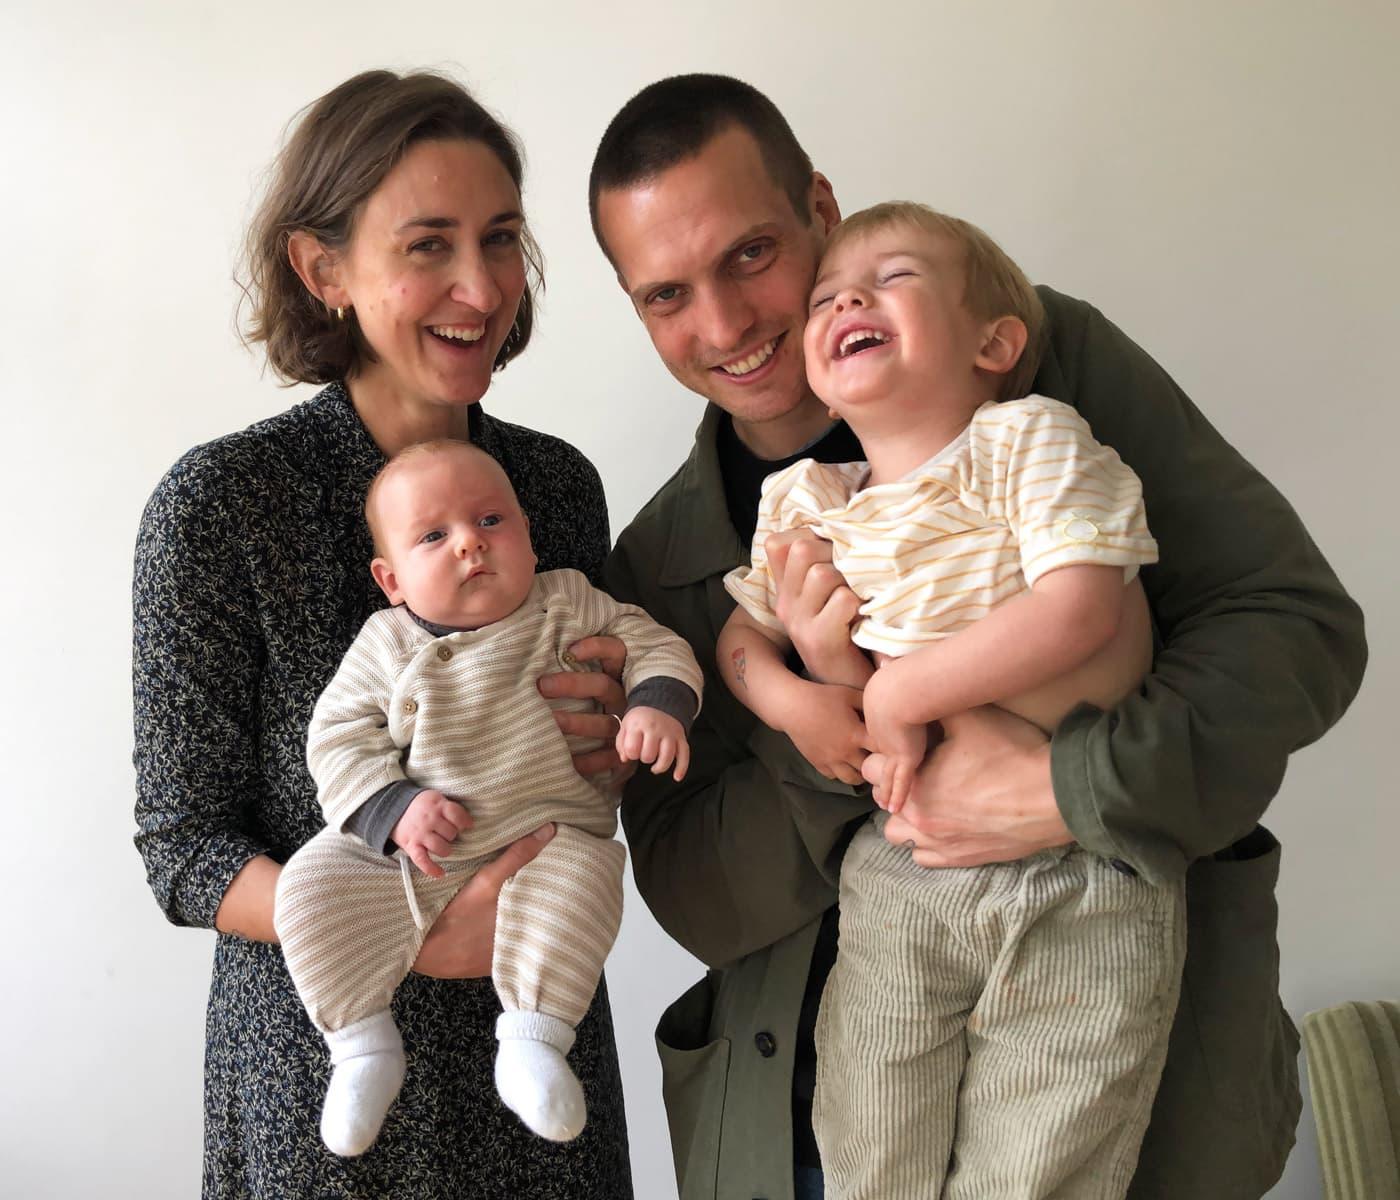 Kinderbuch-Duo Tabea und Jeremias Wolf mit Kindern // HIMBEER